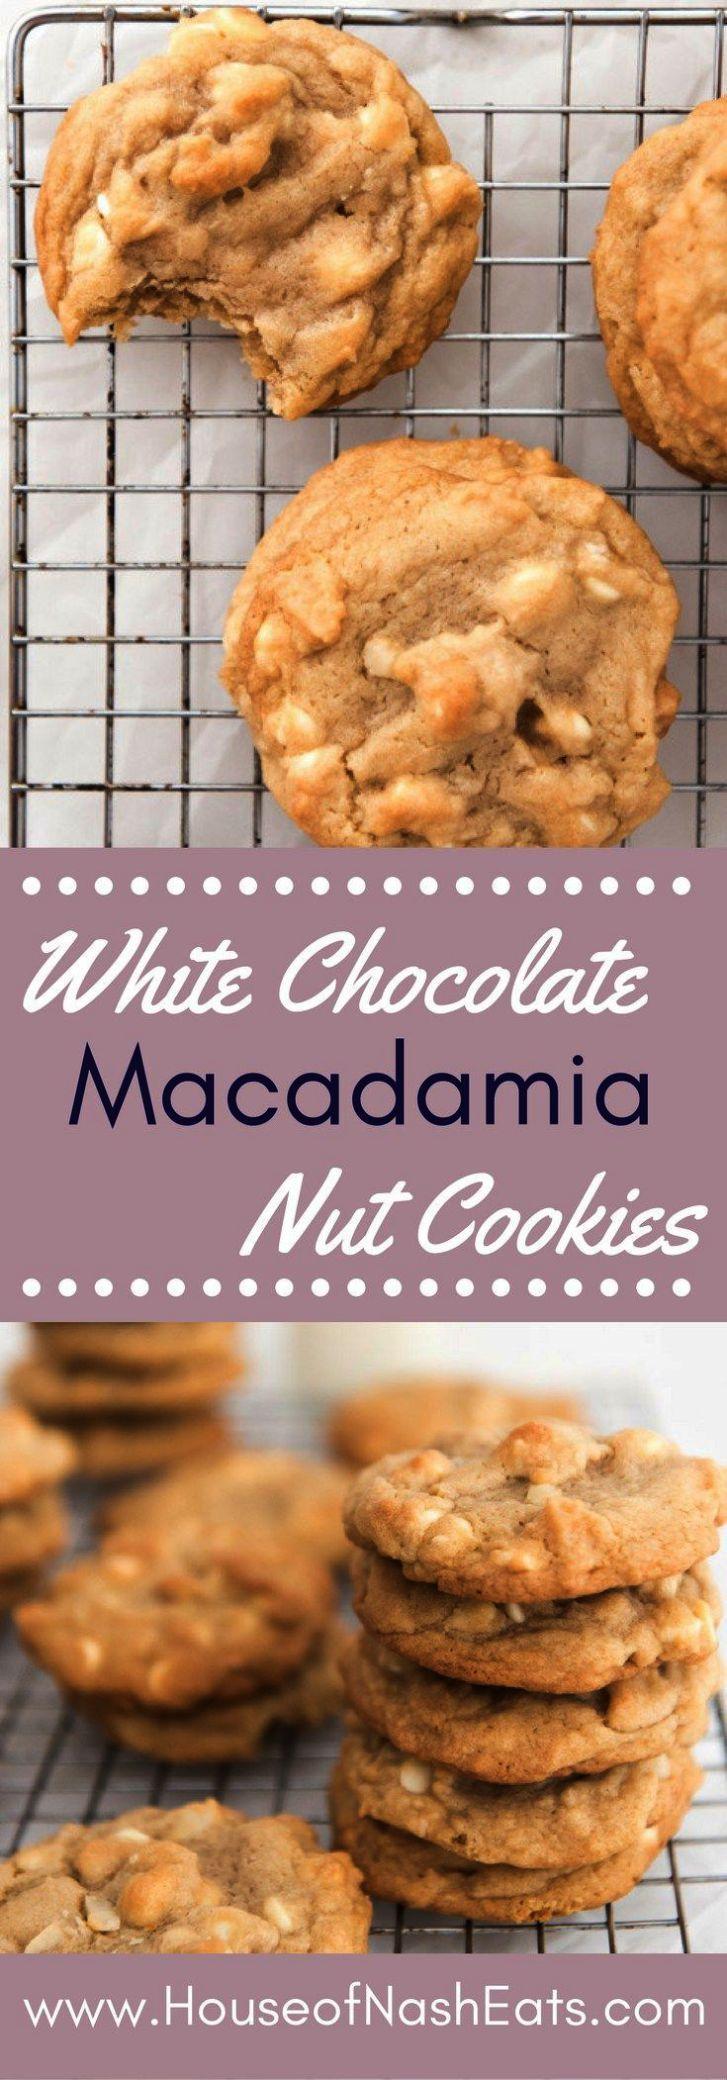 Dessert Recipes Keto Both Dessert Near Me Huddersfield Per Desserts Meanin White Chocolate Macadamia Nut Cookies Macadamia Nut Cookies Chocolate Macadamia Nuts